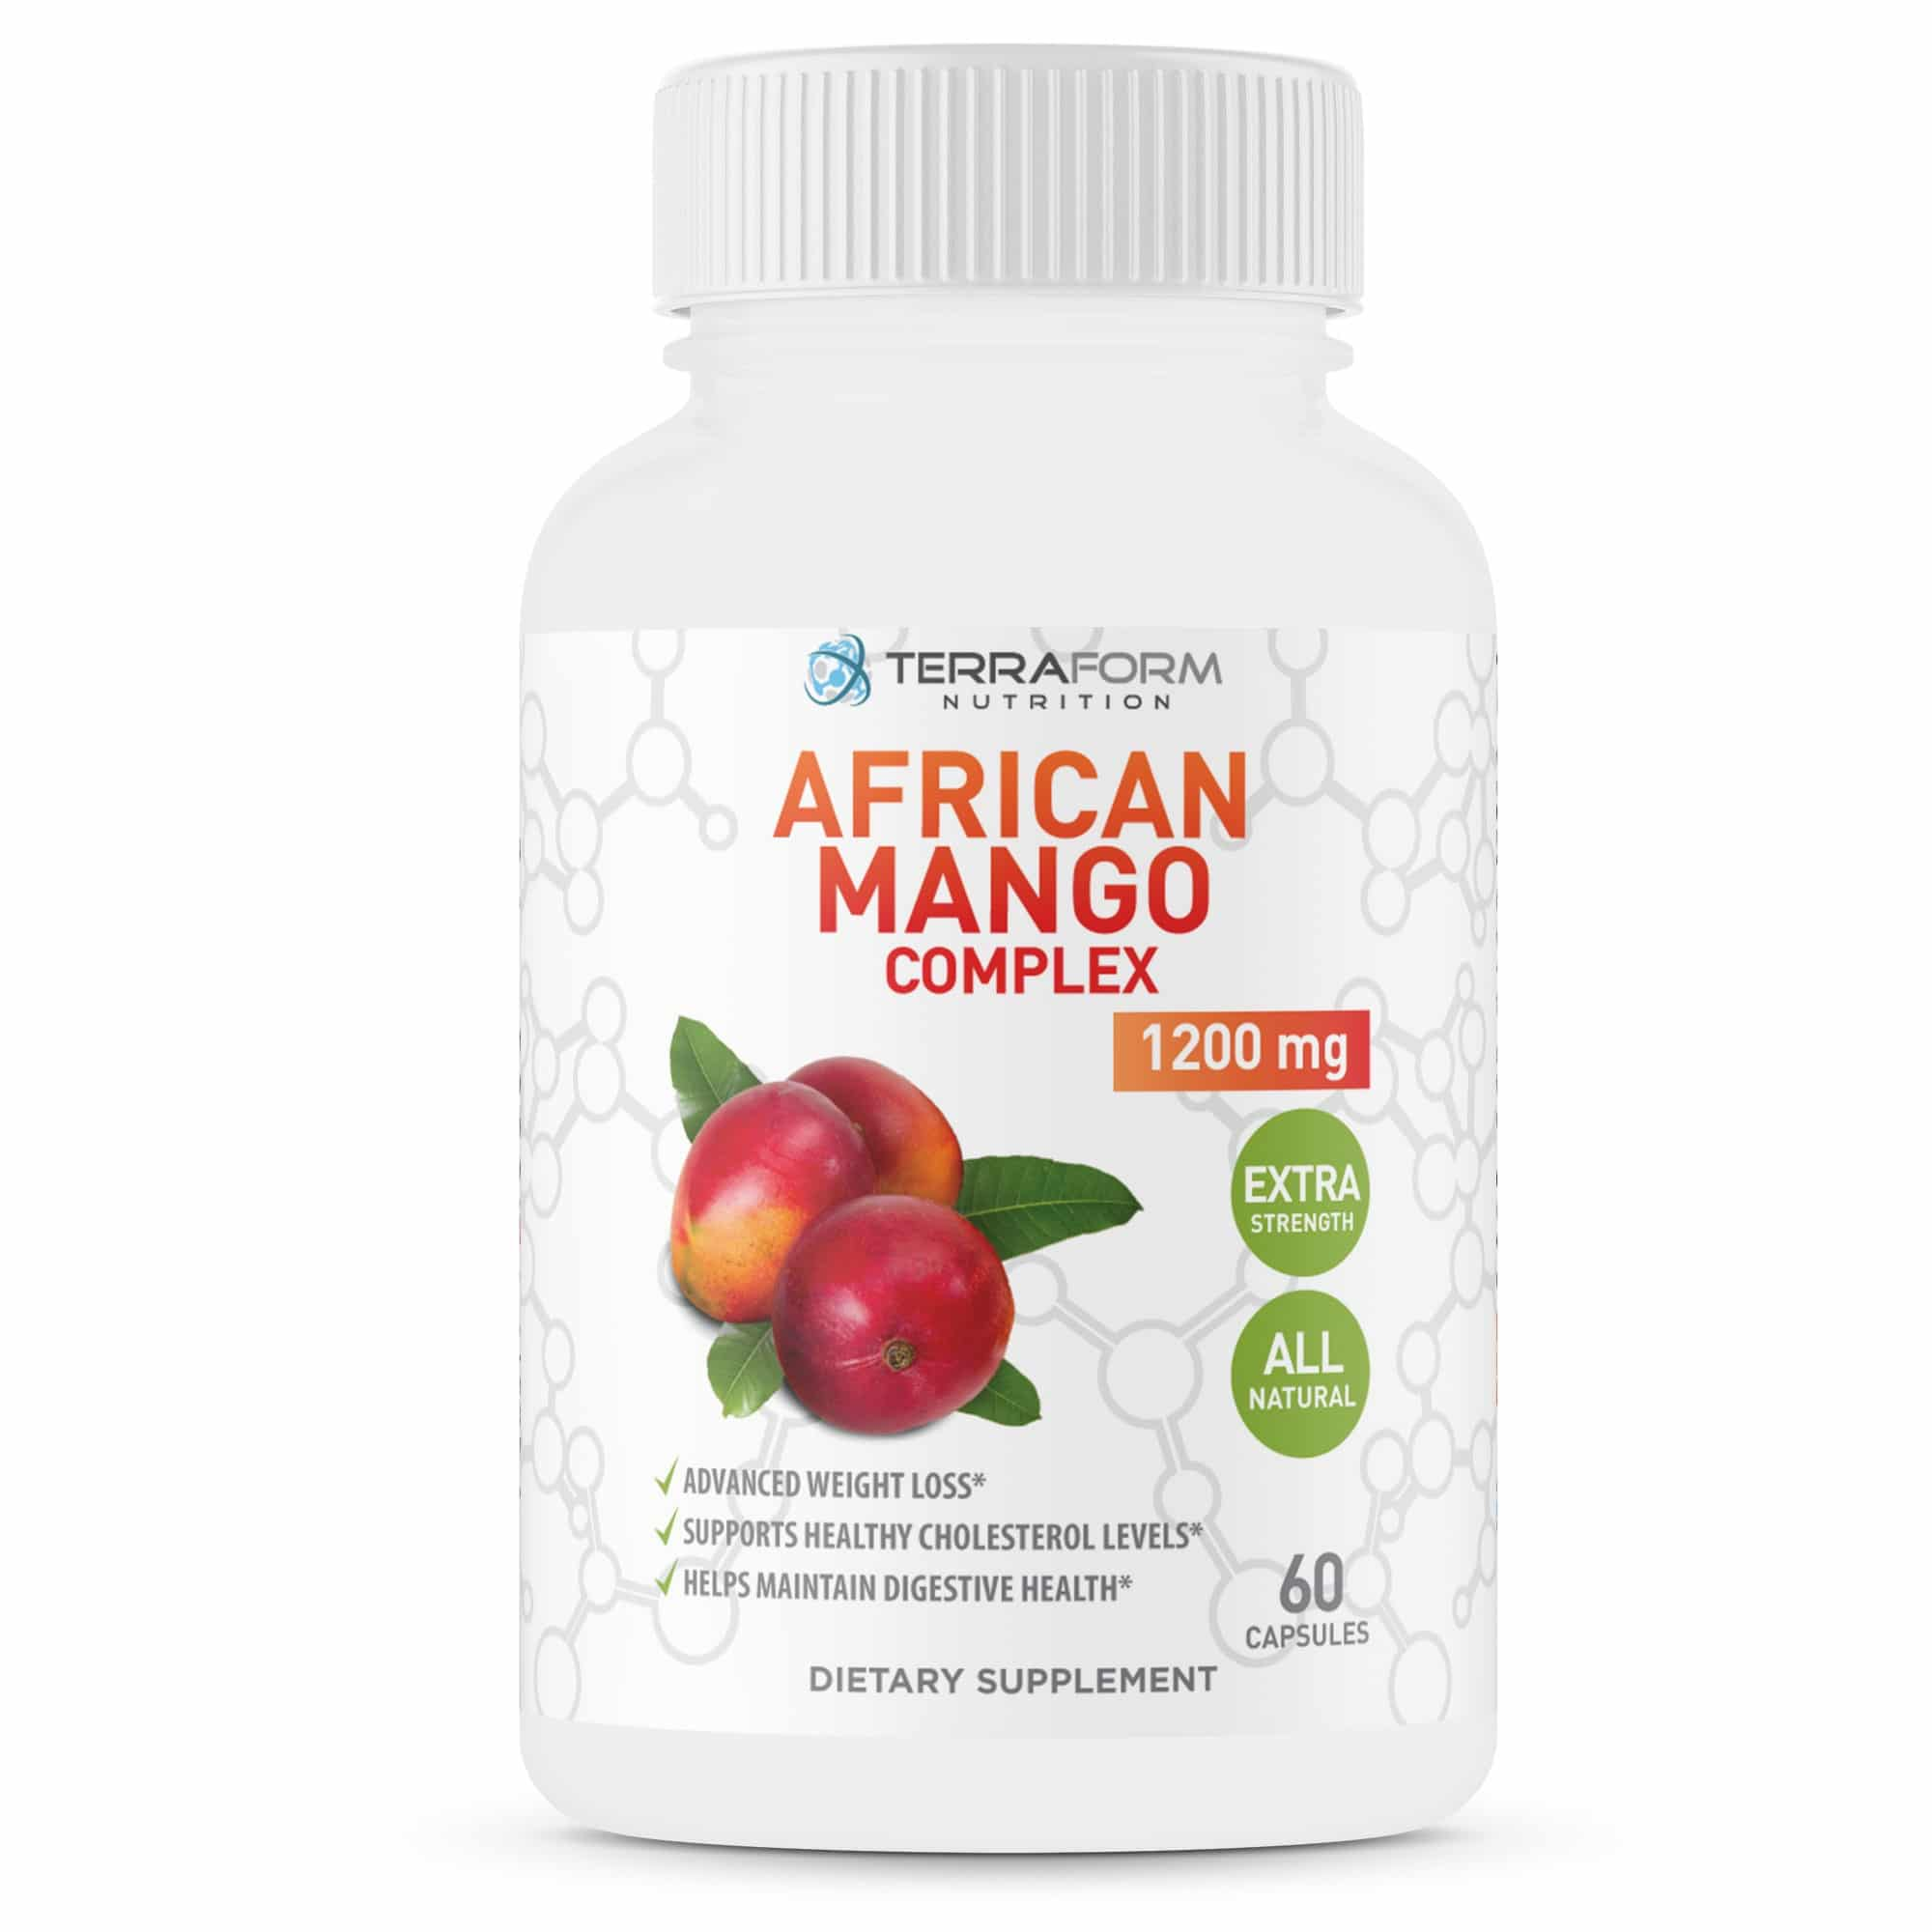 African Mango Complex Diet Pills 1 Month Terraform Nutrition